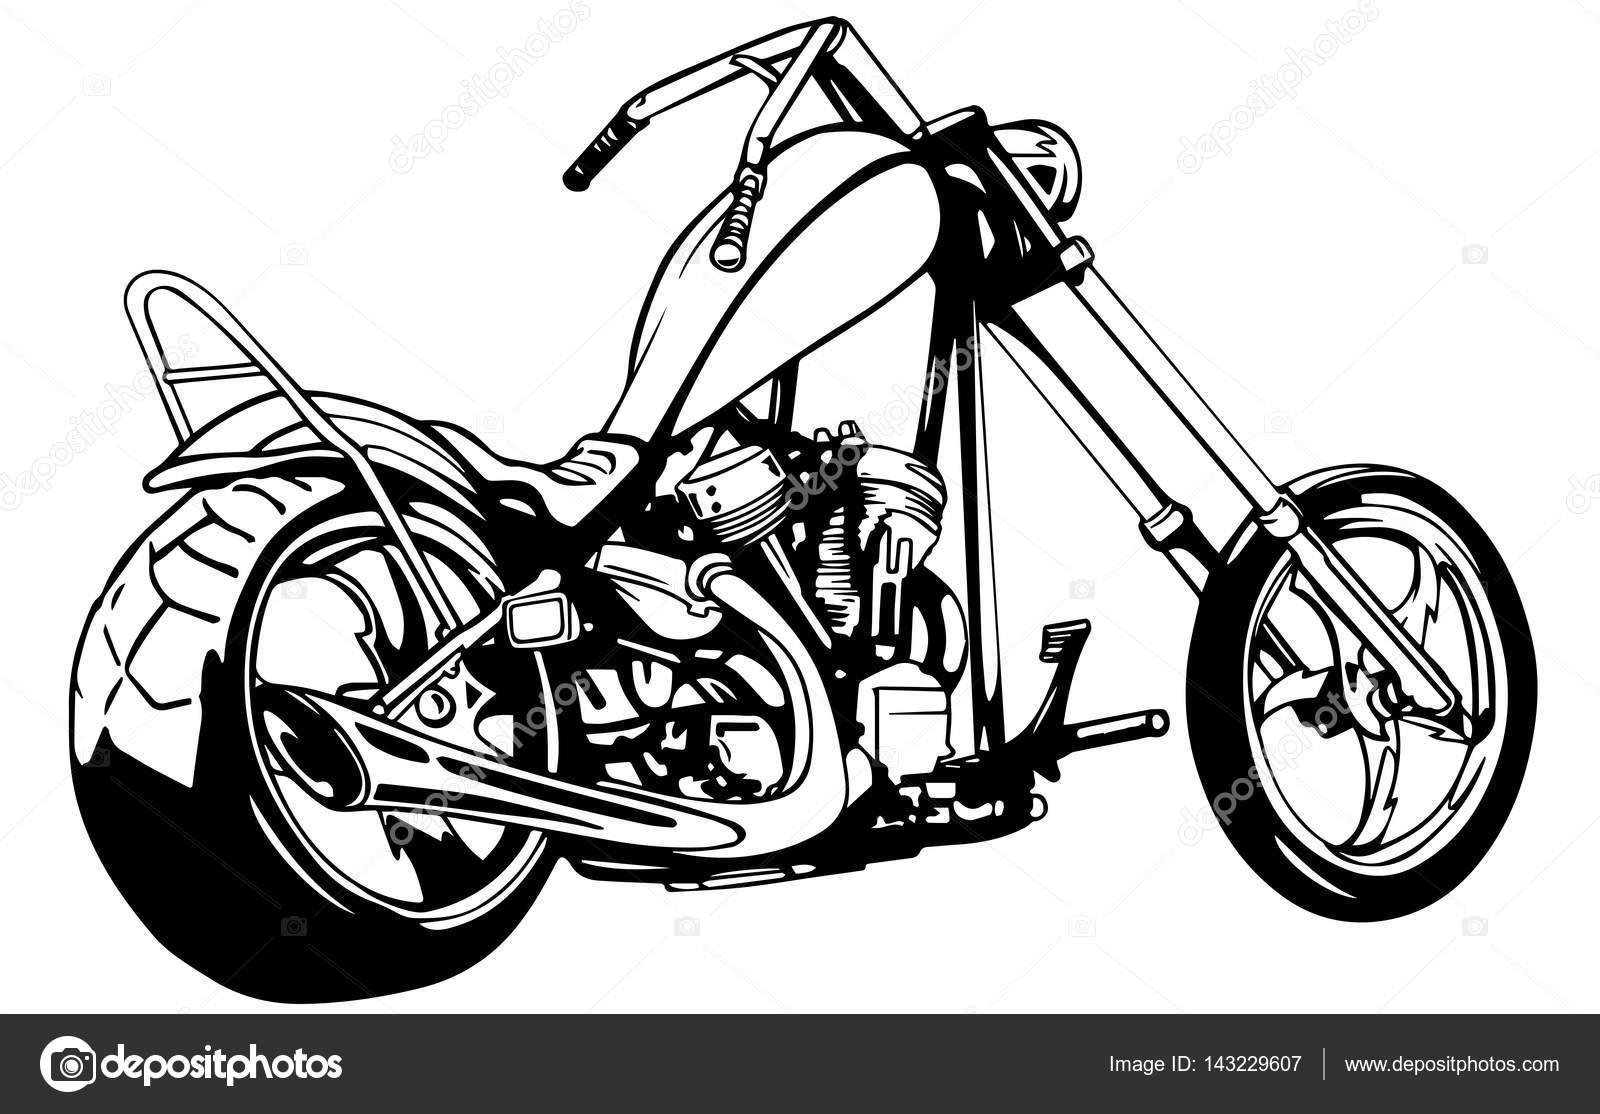 flaming bike chopper ride front view eps 10 vector free harley davidson logo stencils Harley-Davidson Stencil Patterns